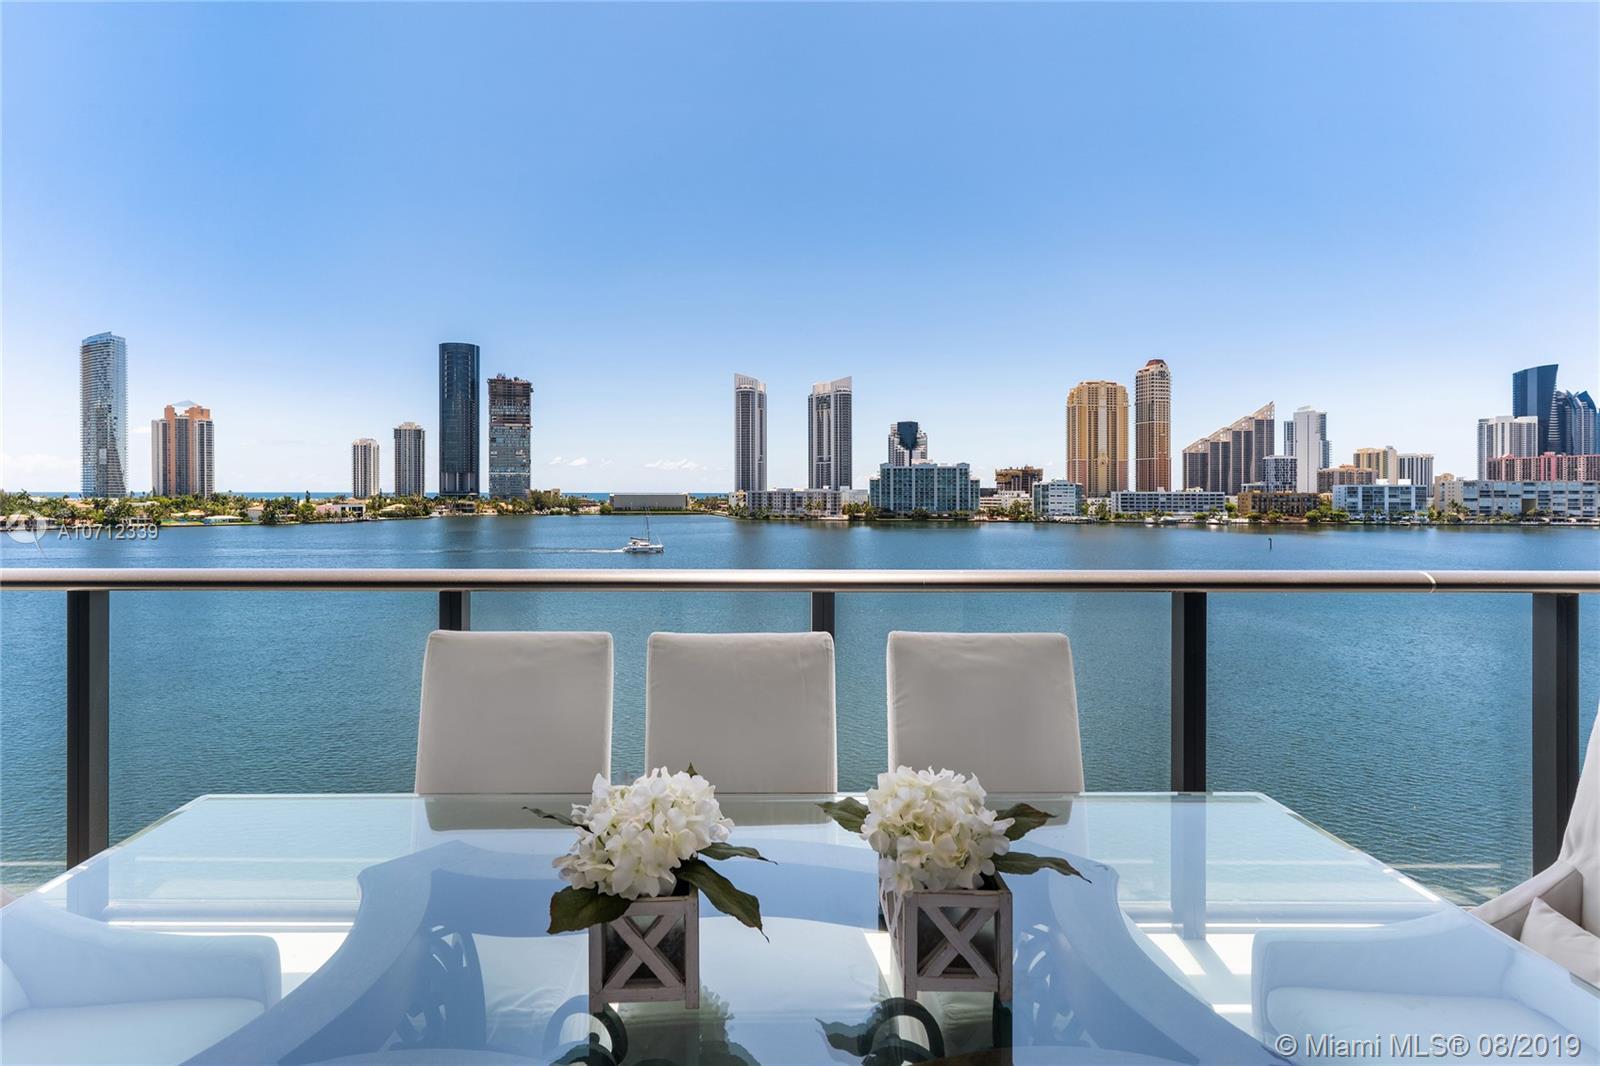 Prive 1 #508 - 5000 Island Estates Dr #508, Aventura, FL 33180